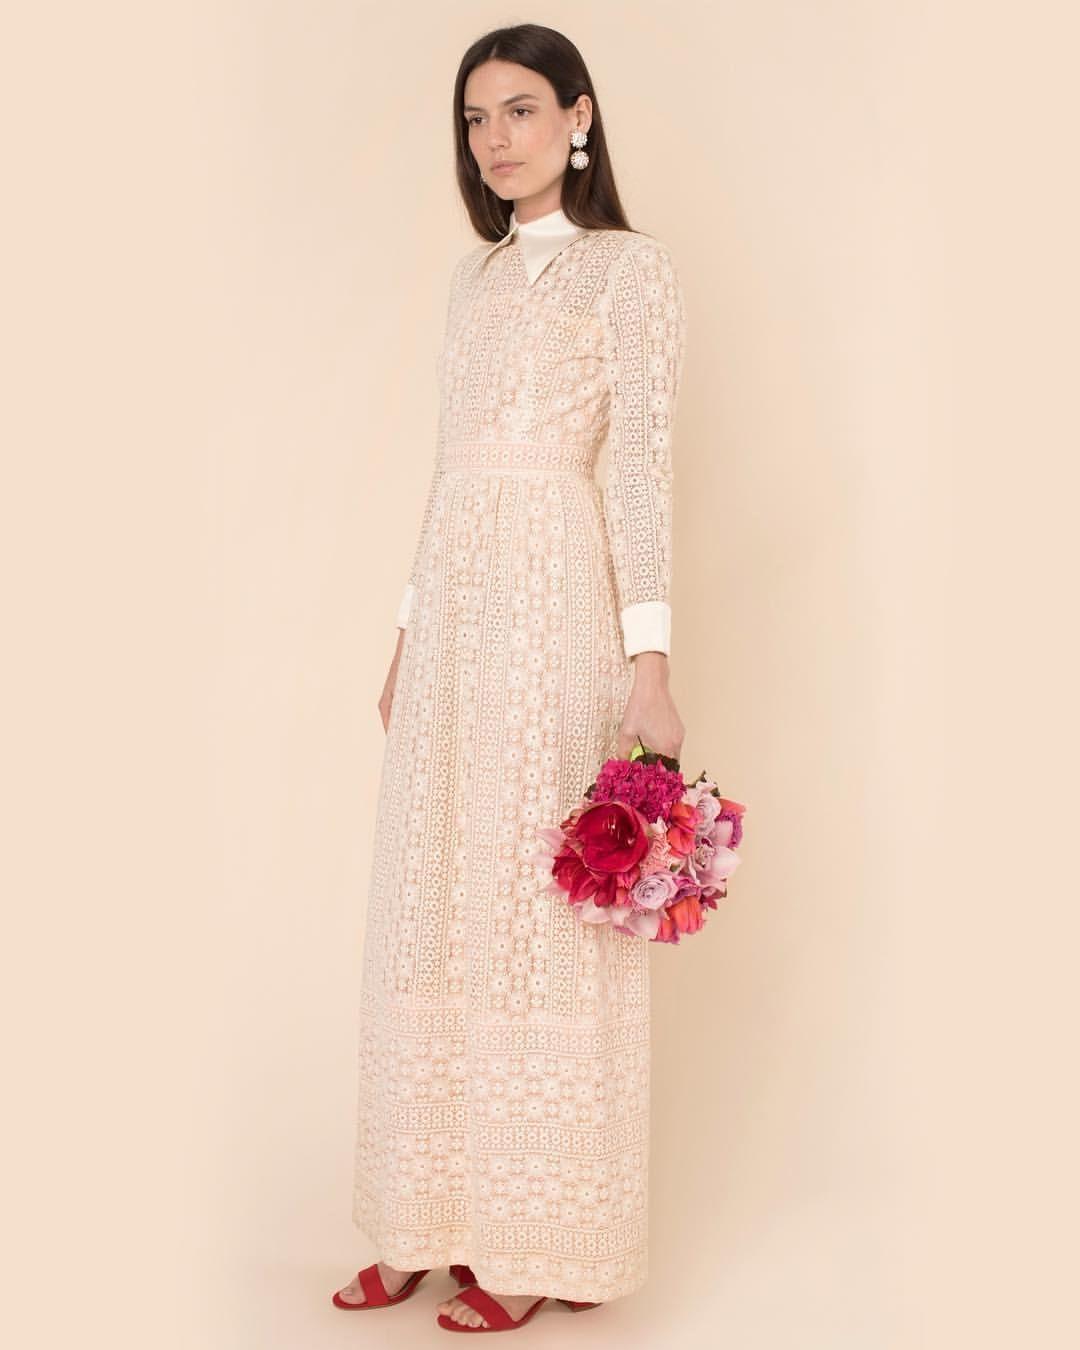 Saks Fifth Avenue Wedding Gowns: Happy Isles (@happyisles_salon) On